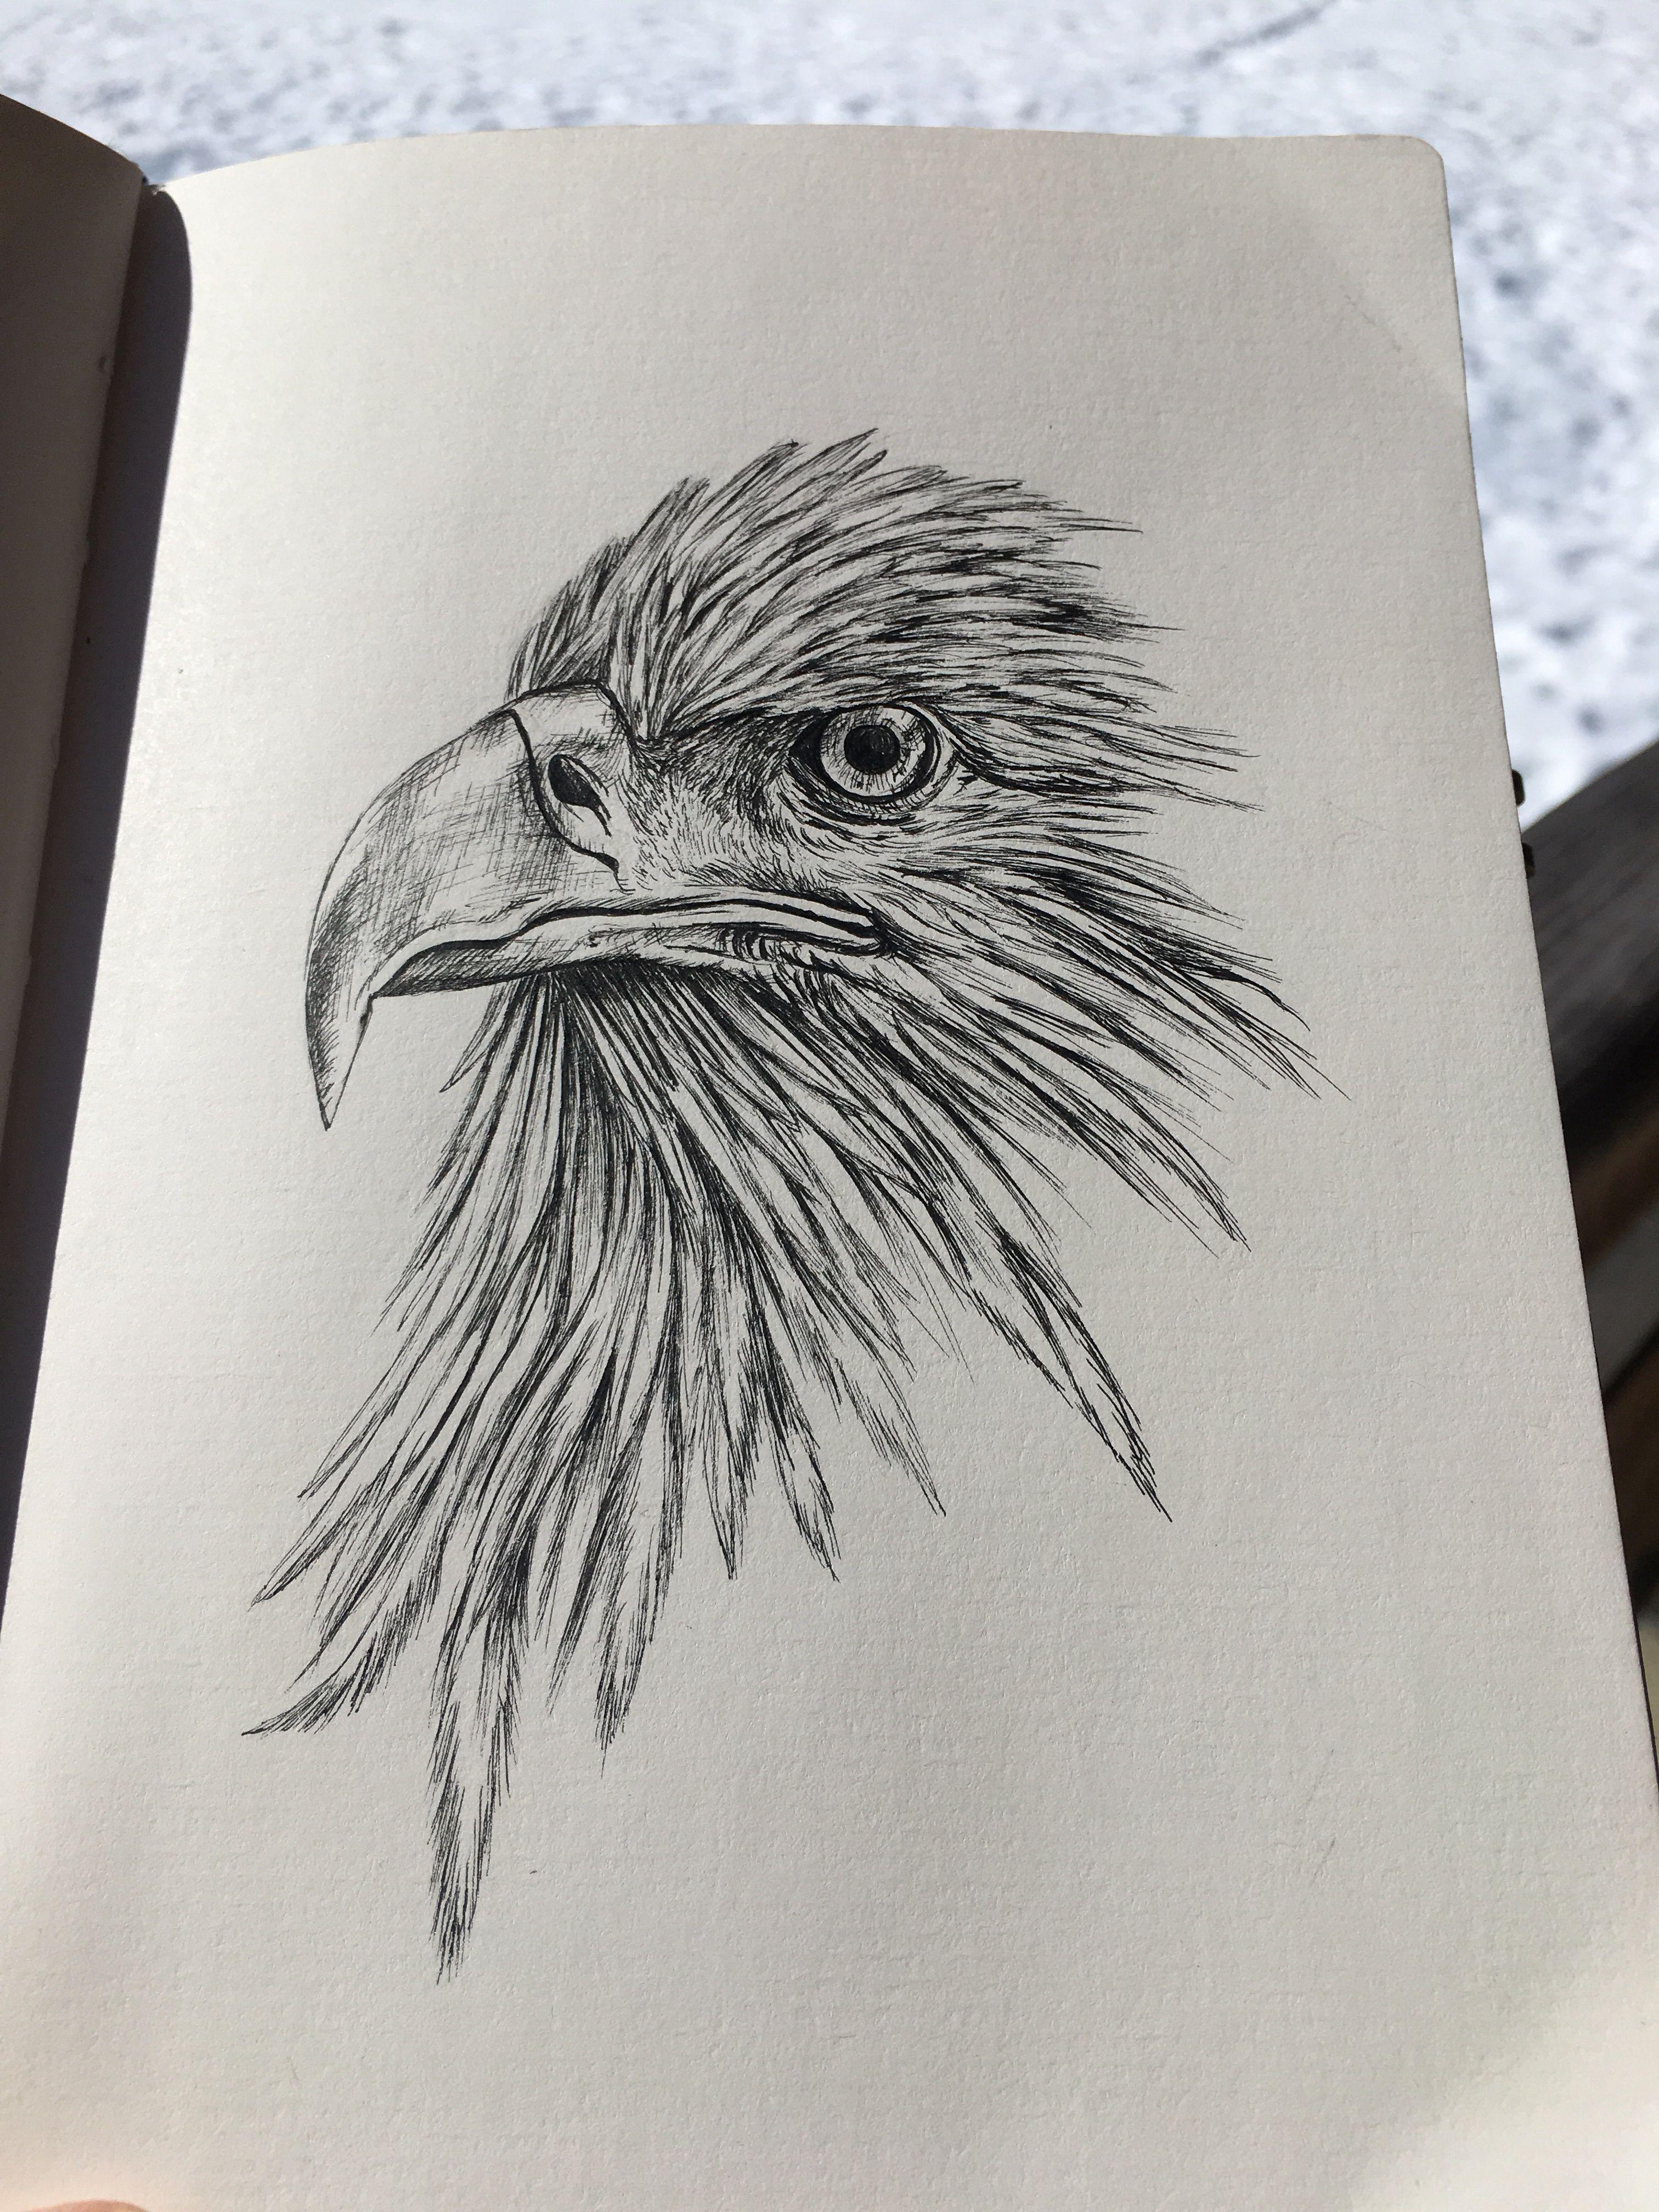 Crayonne Draw Drawings Dessin Crayonart Crayon Aigle